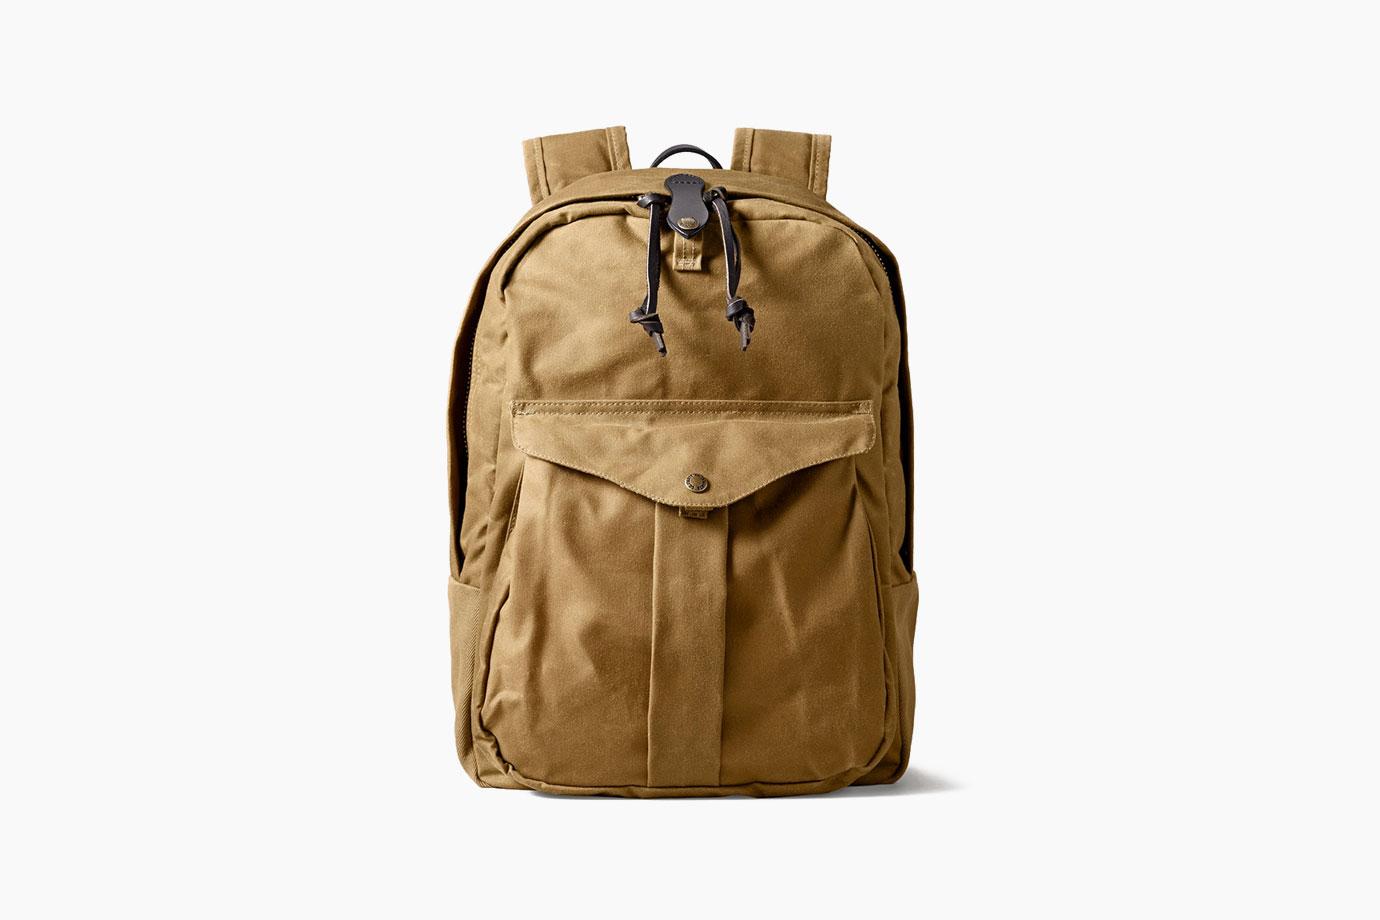 Journeyman Backpack - Filson